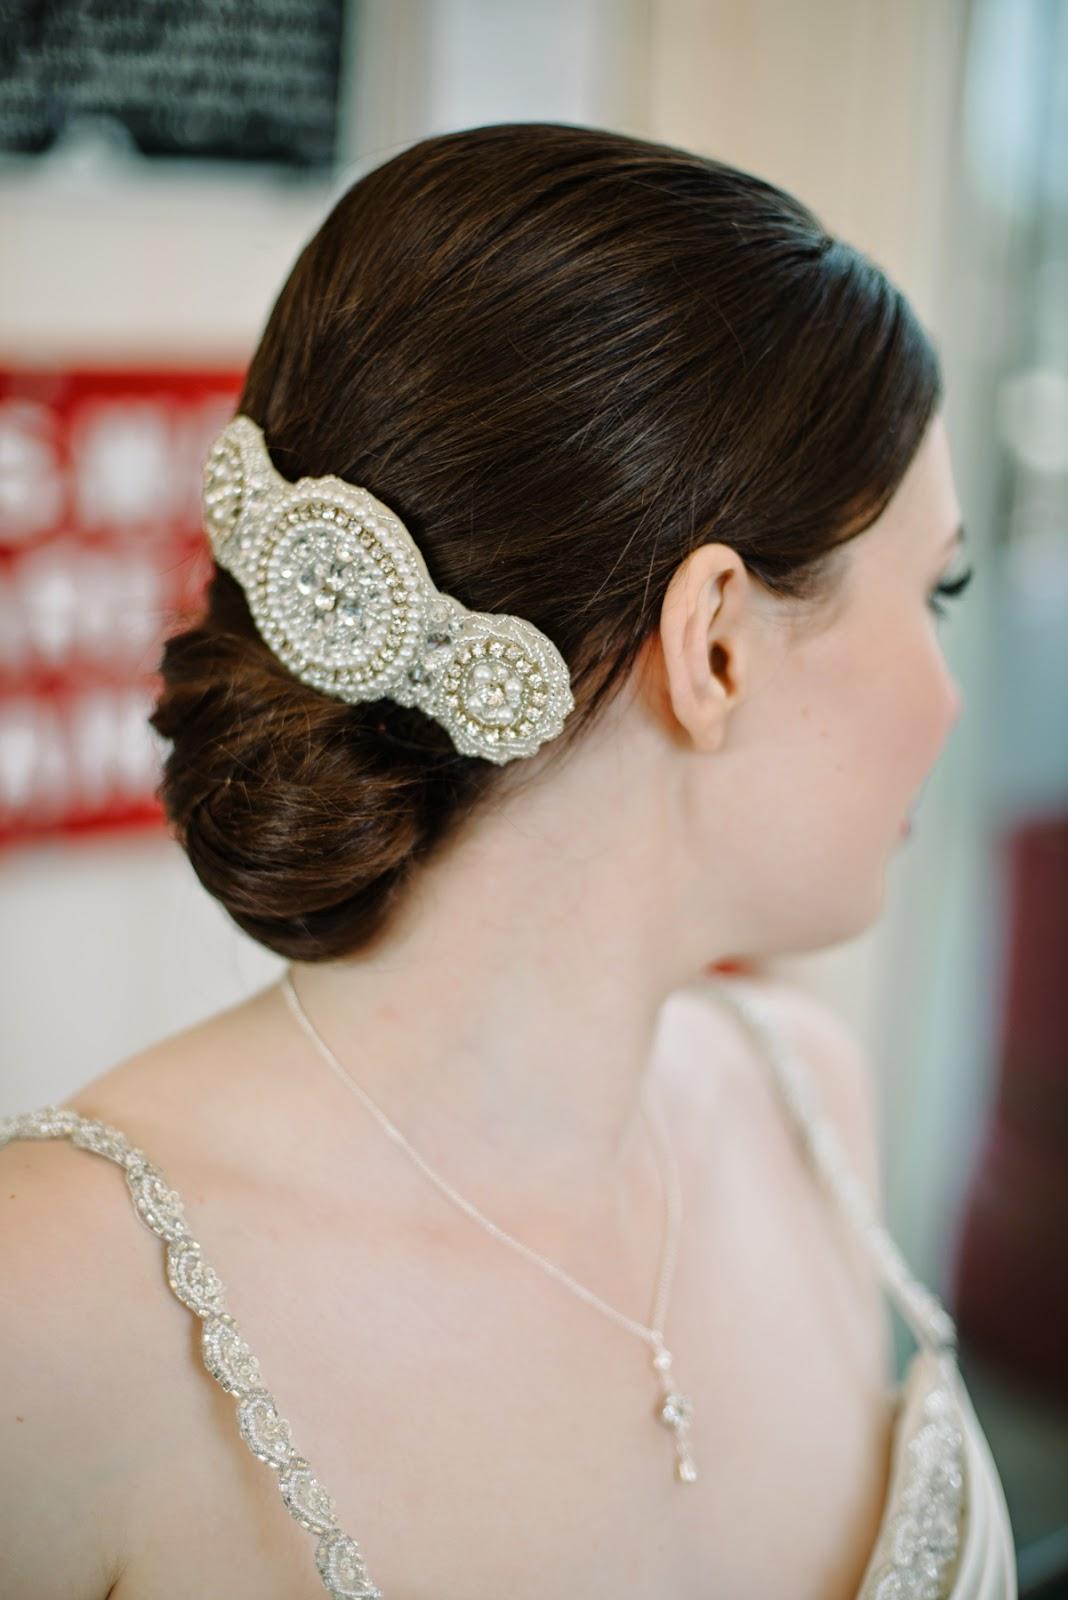 wedding hair comb 2015, statement wedding headpiece 2015, 2015 wedding headpiece,